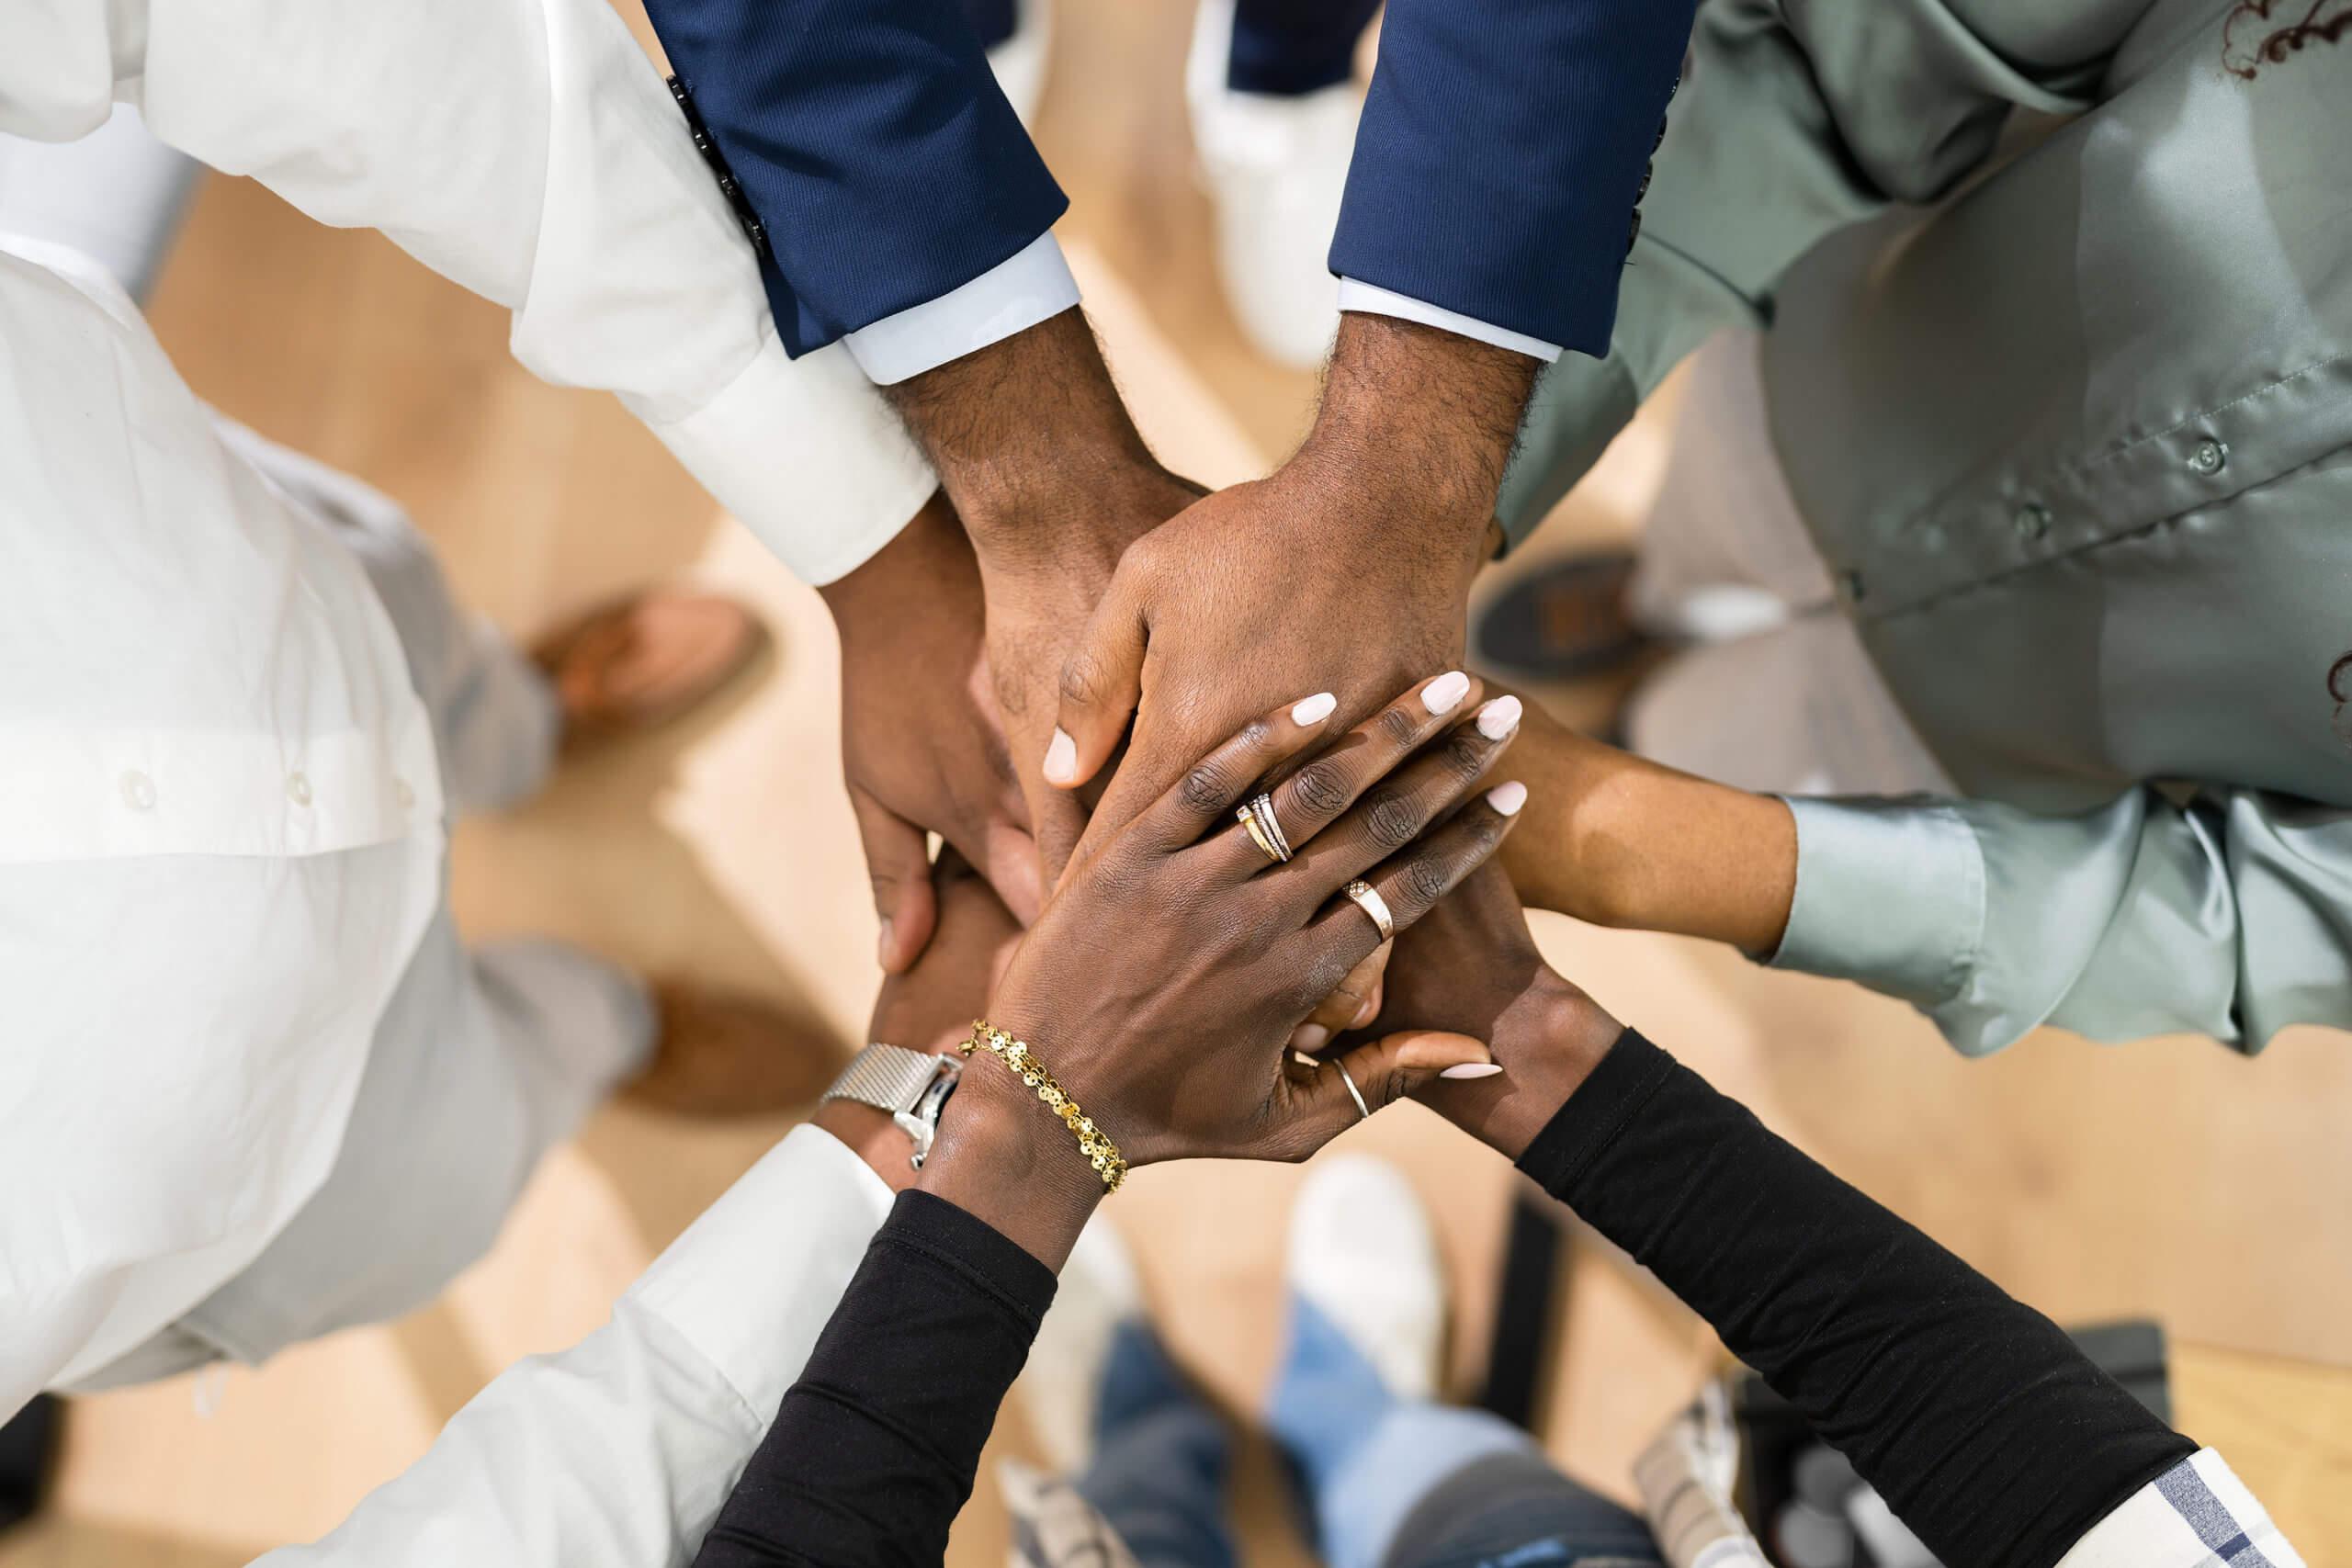 African Business Team Hands. Community Spirit Concept